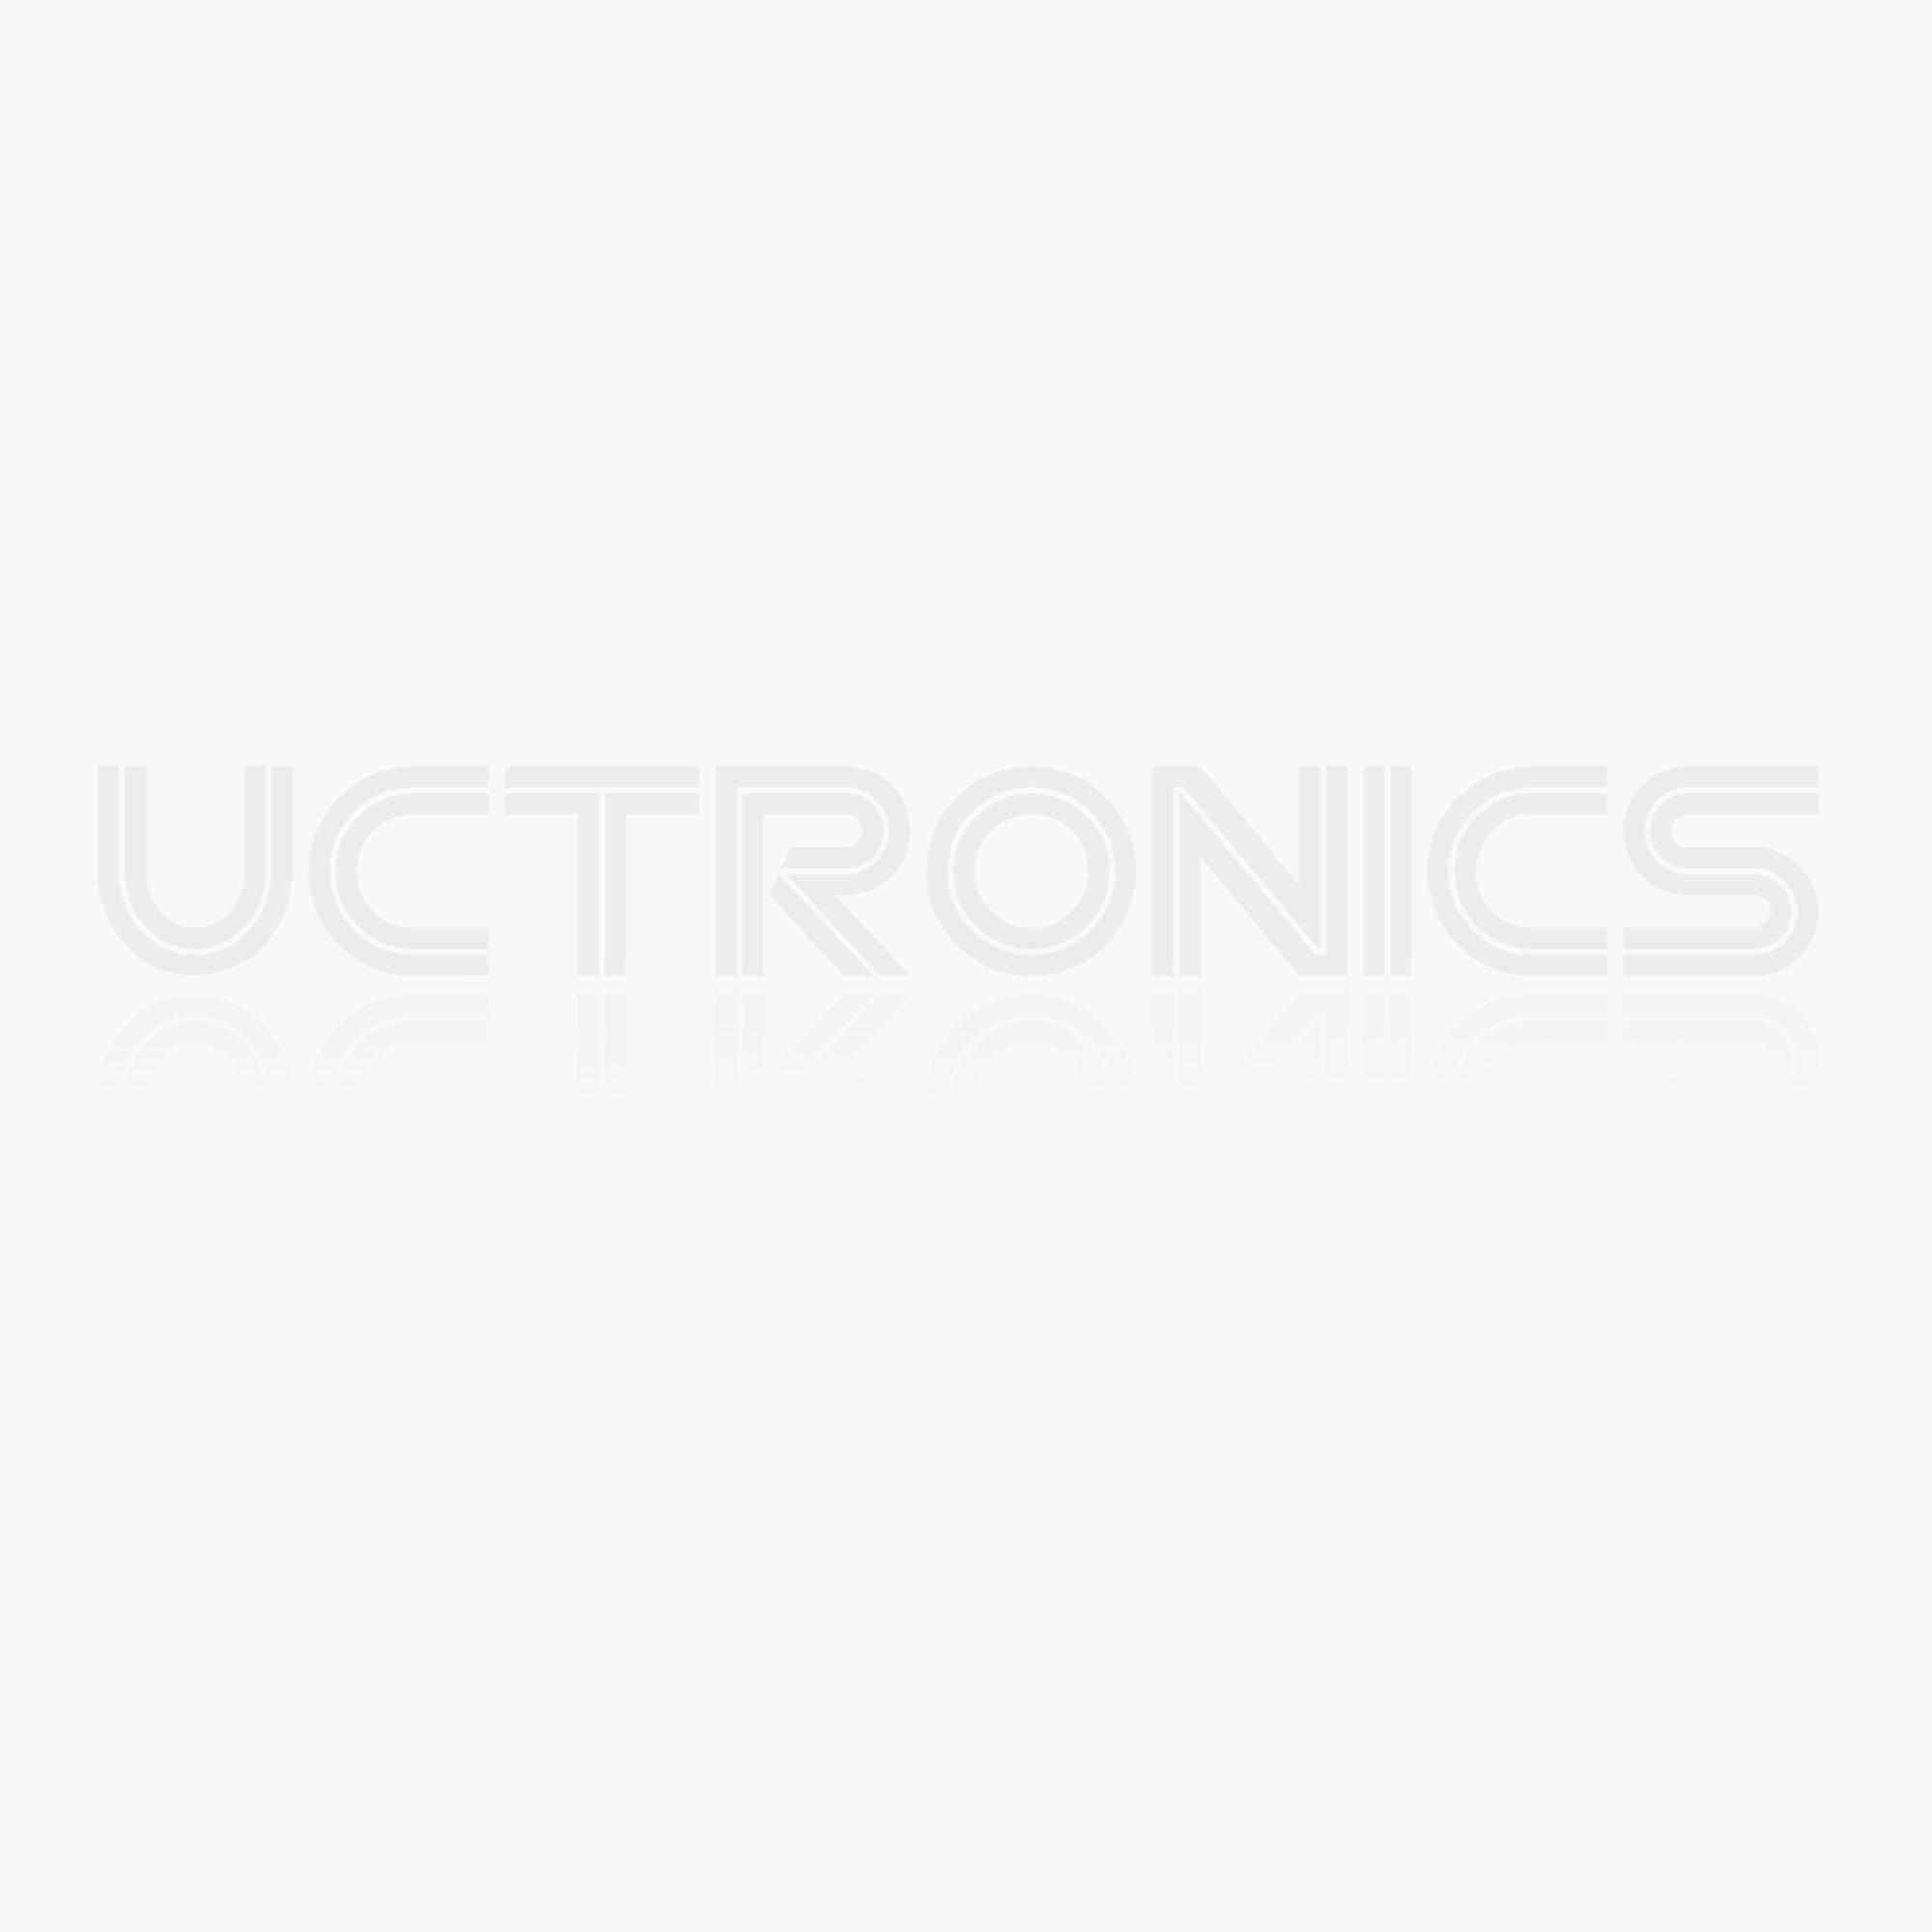 UNO 2011 ATMEGA328P ATMEGA8U2 microcontroller Arduino fully compatible